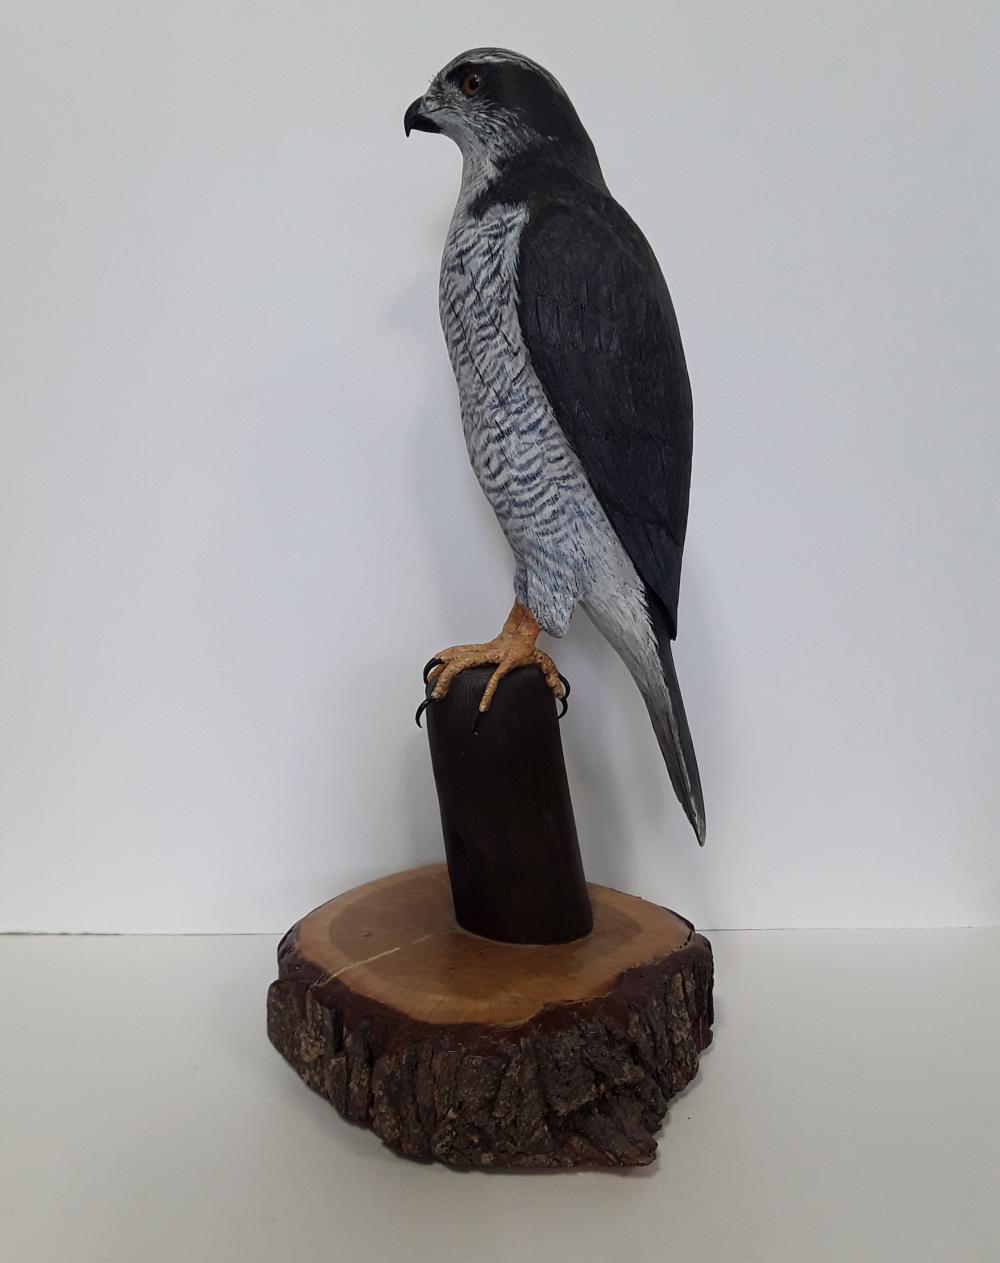 Tony Bendig's Falcon Carving